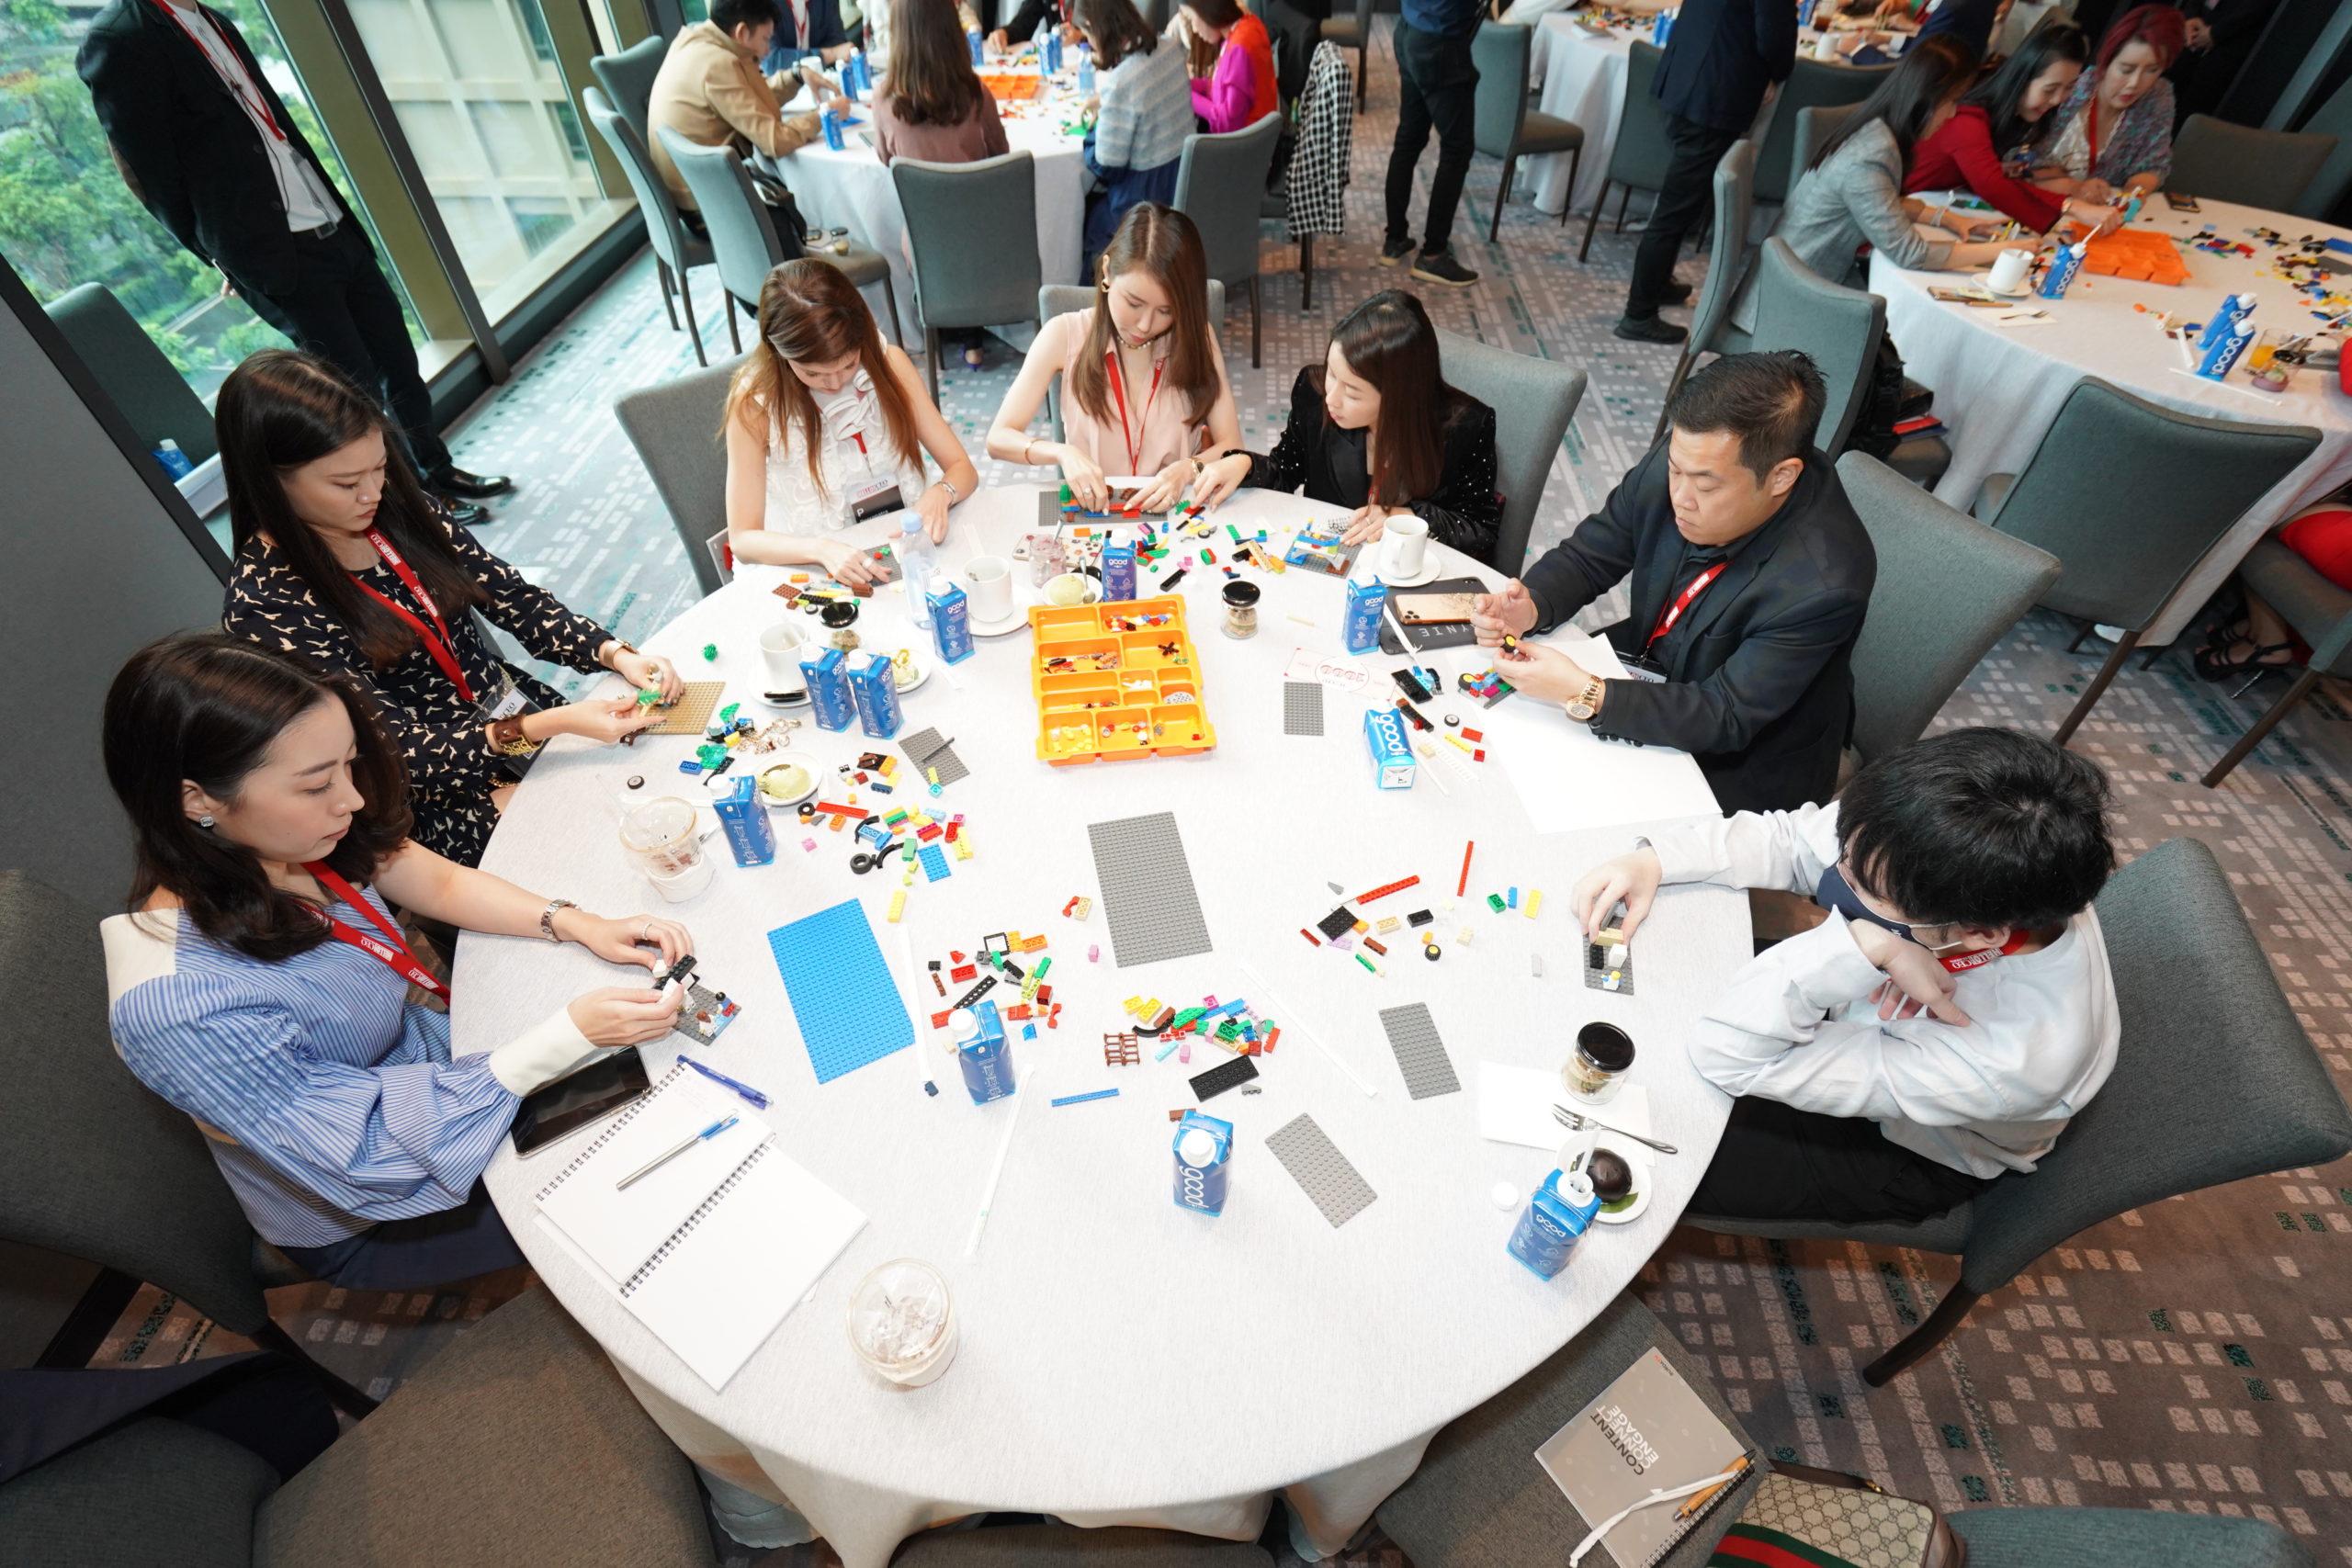 Hello! CEO branding ค้นพบจุดเข็งของ Personal branding กับกิจกรรม Lego serious play